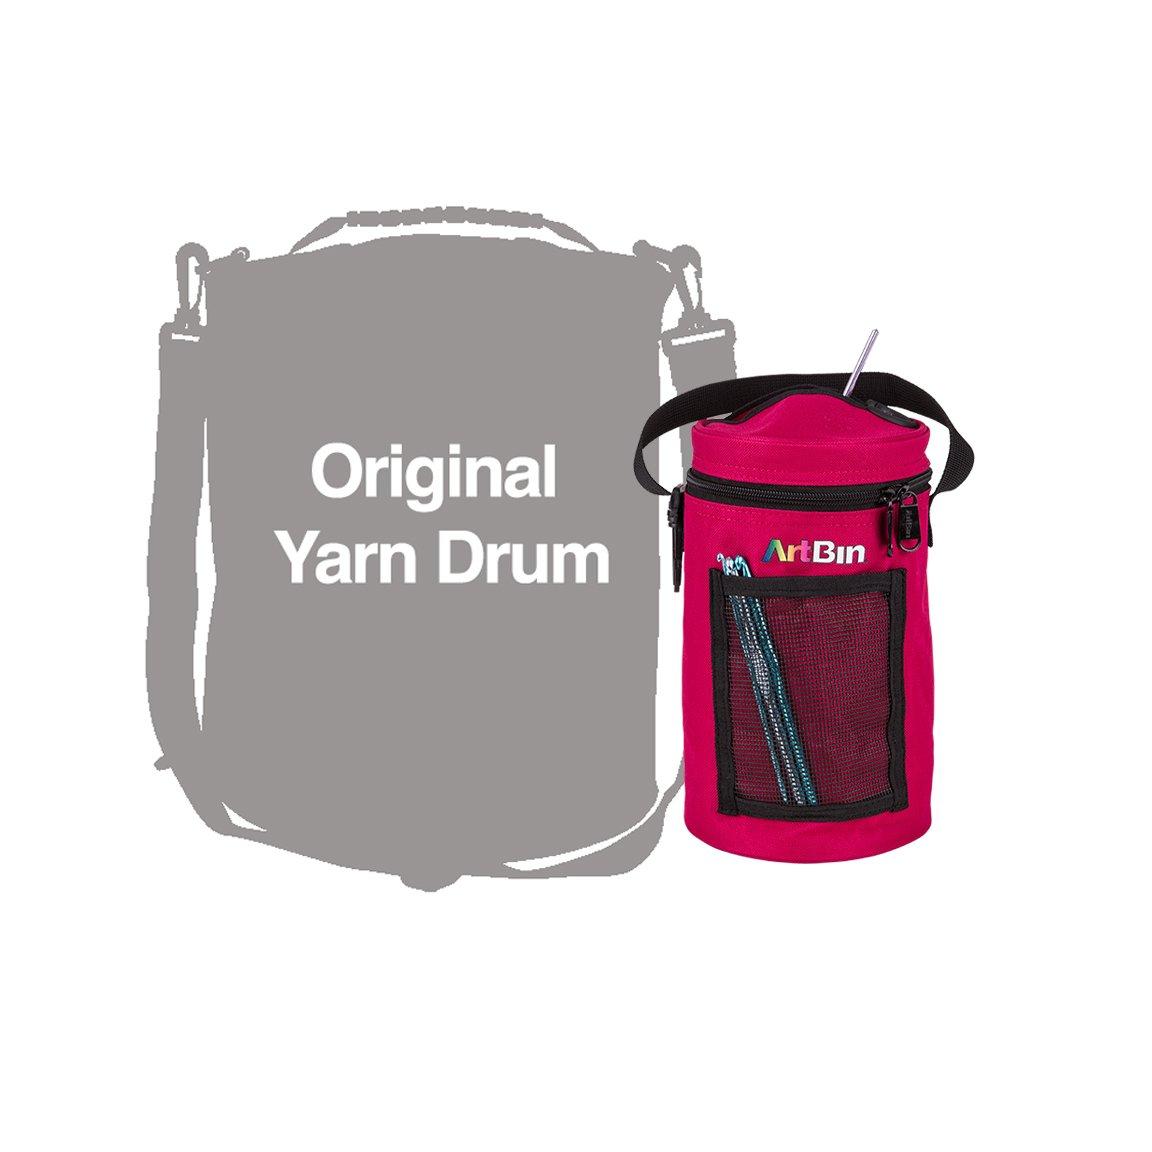 ArtBin Mini Yarn Drum Knitting & Crocheting Tote Bag-Raspberry, 6831AG Flambeau Inc.